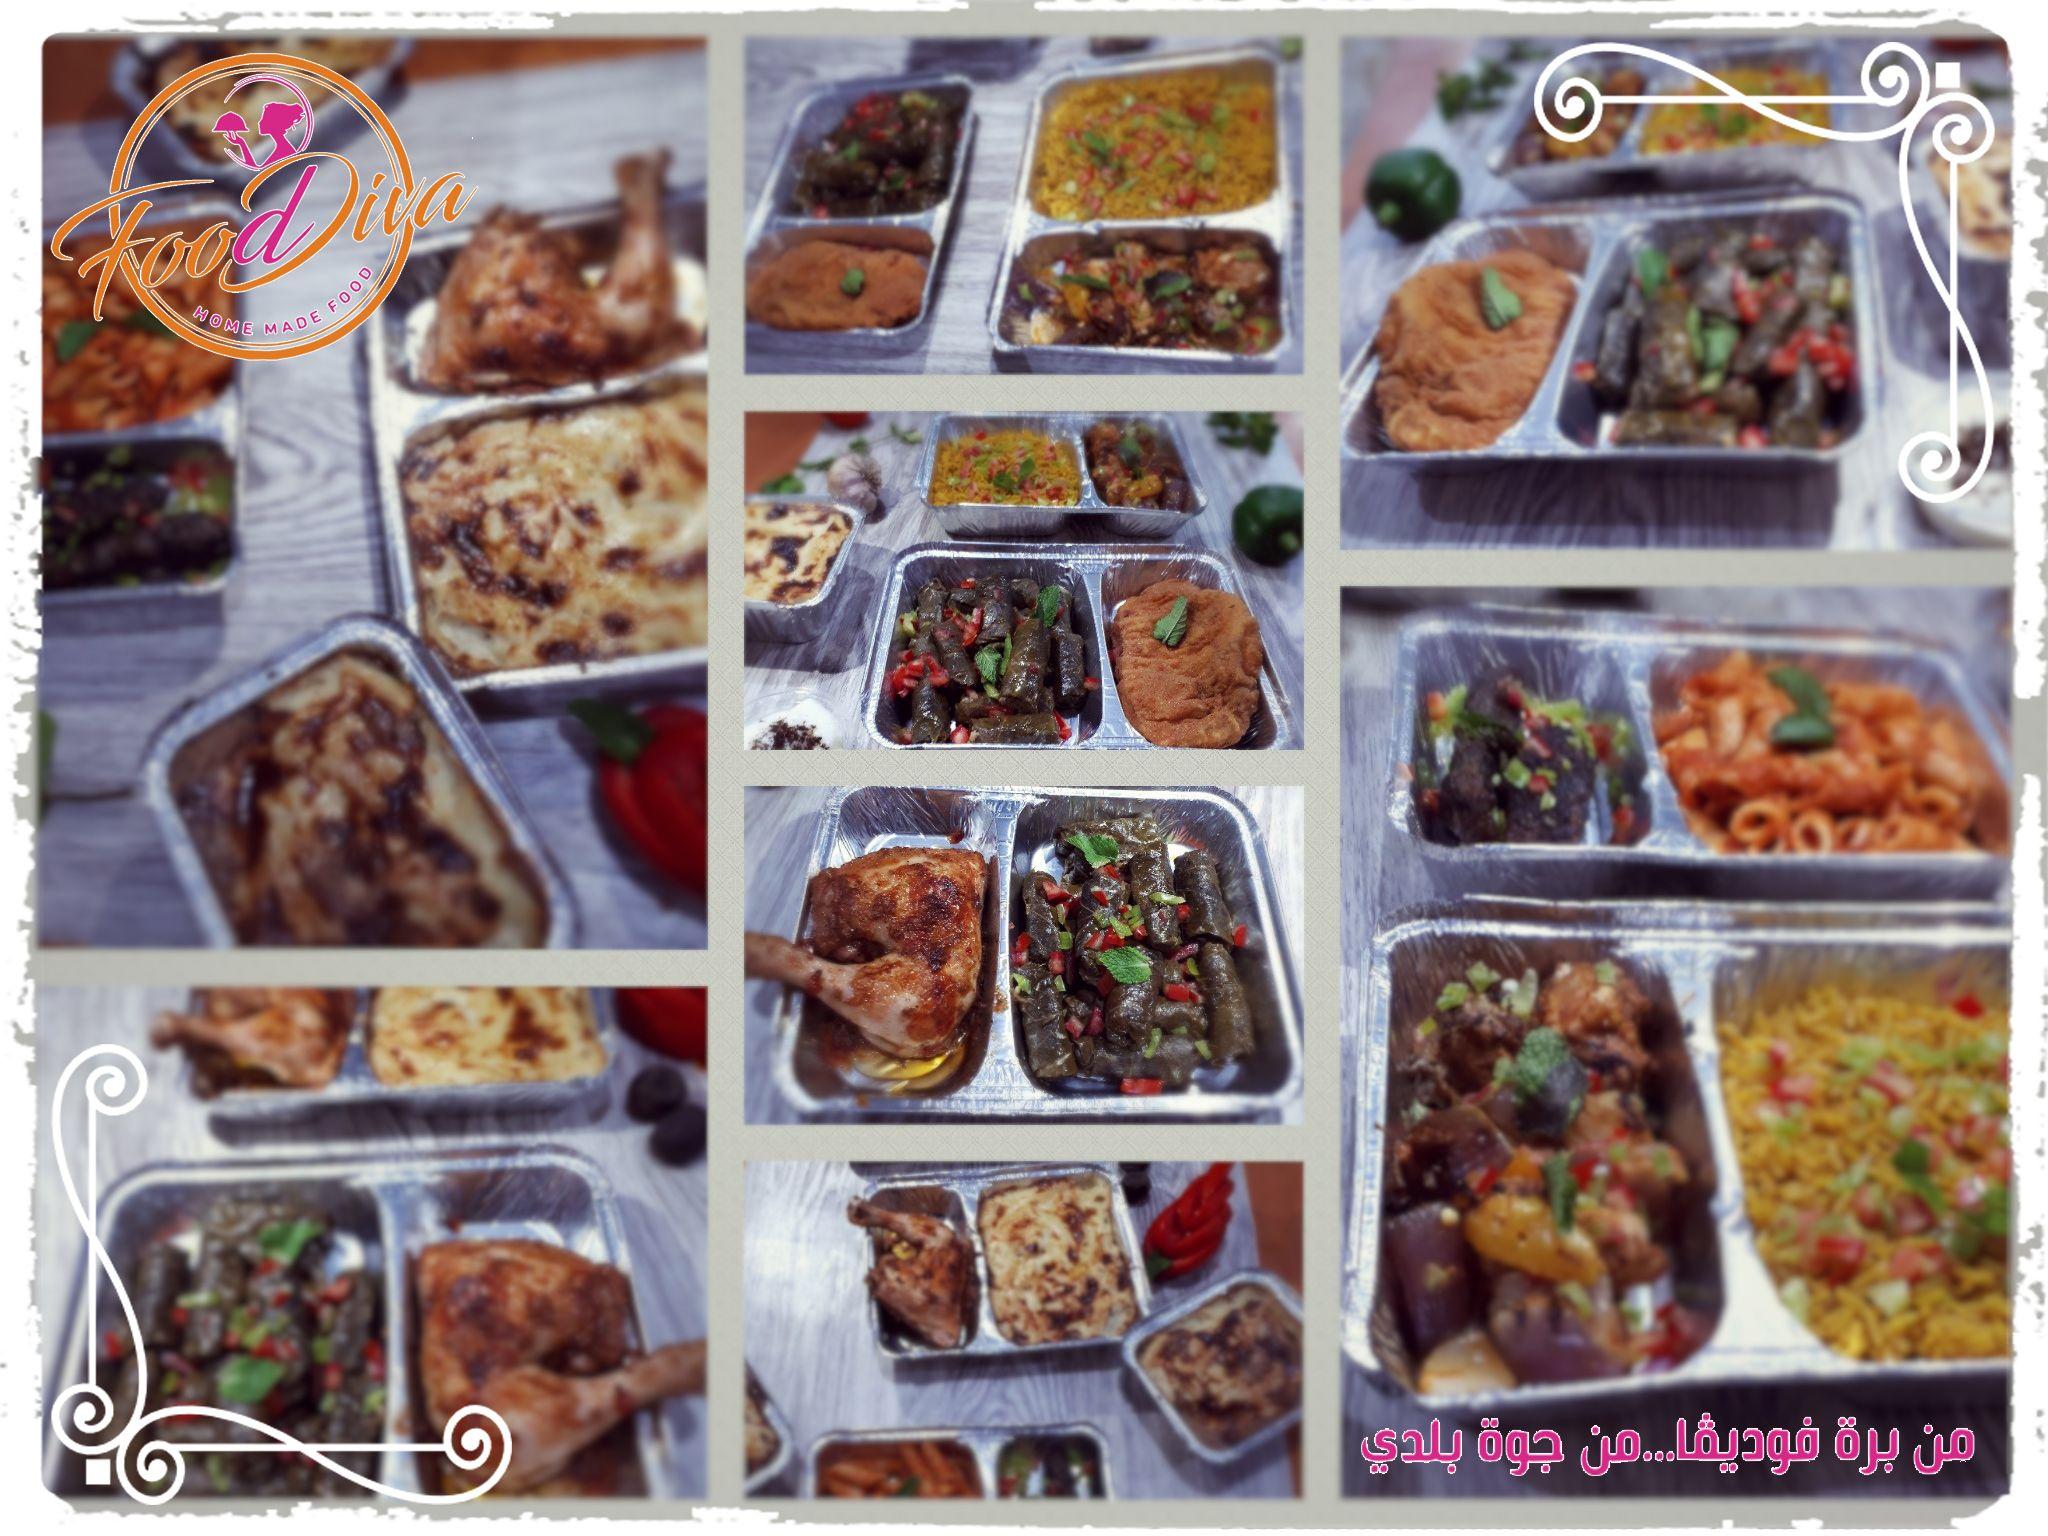 احلي وجبات من فوديڤا Food Beef Menu Items